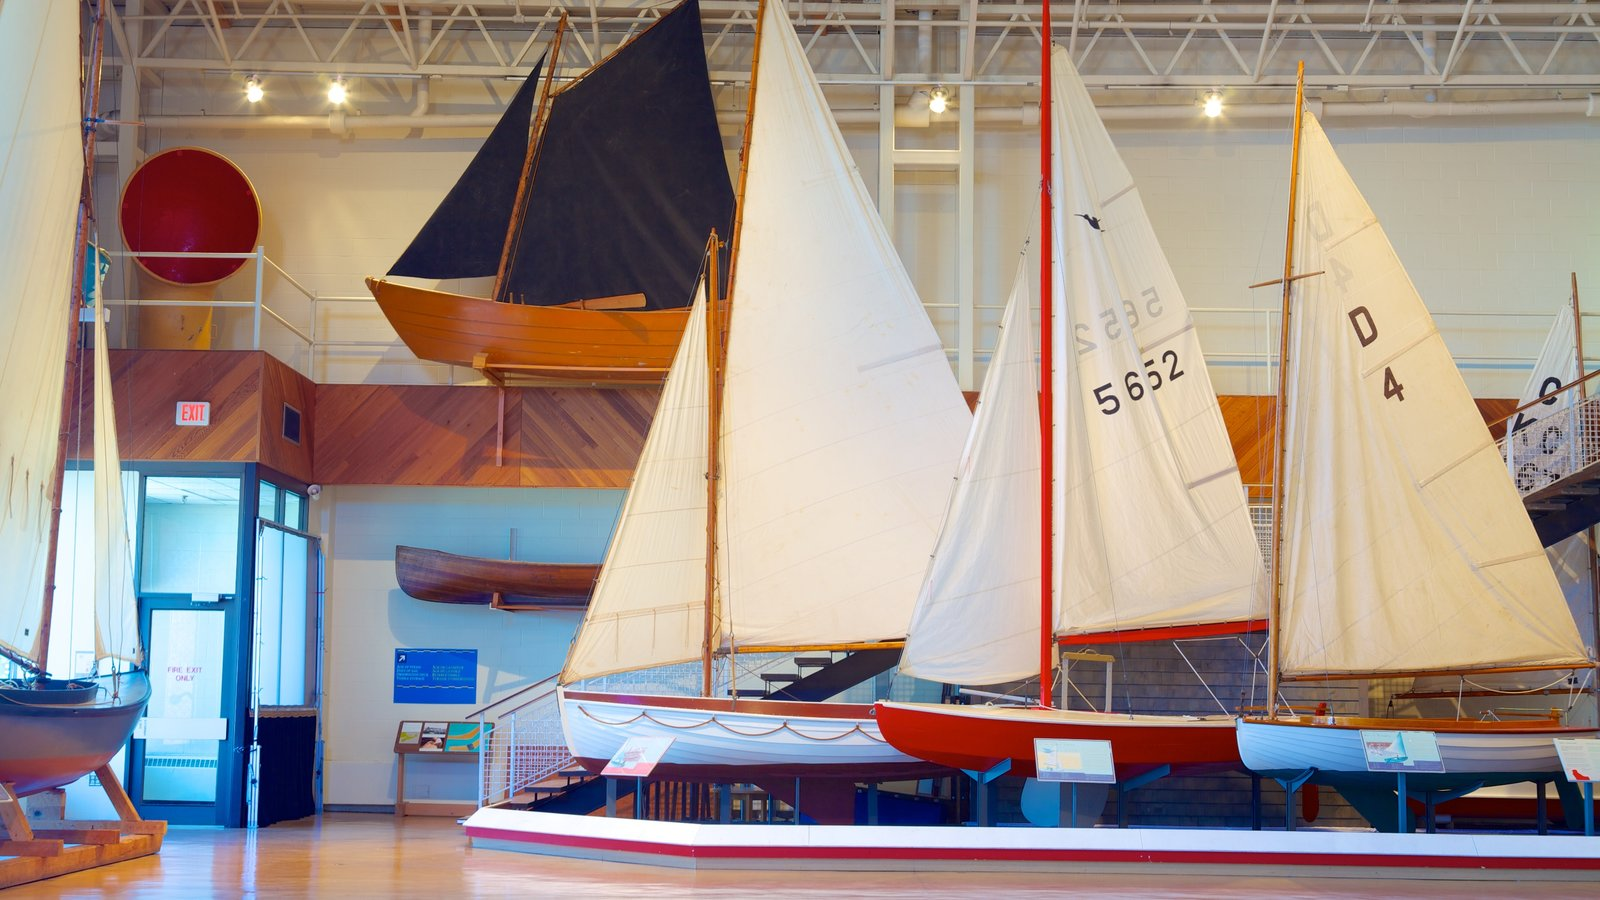 Maritime Museum of the Atlantic ofreciendo vistas interiores